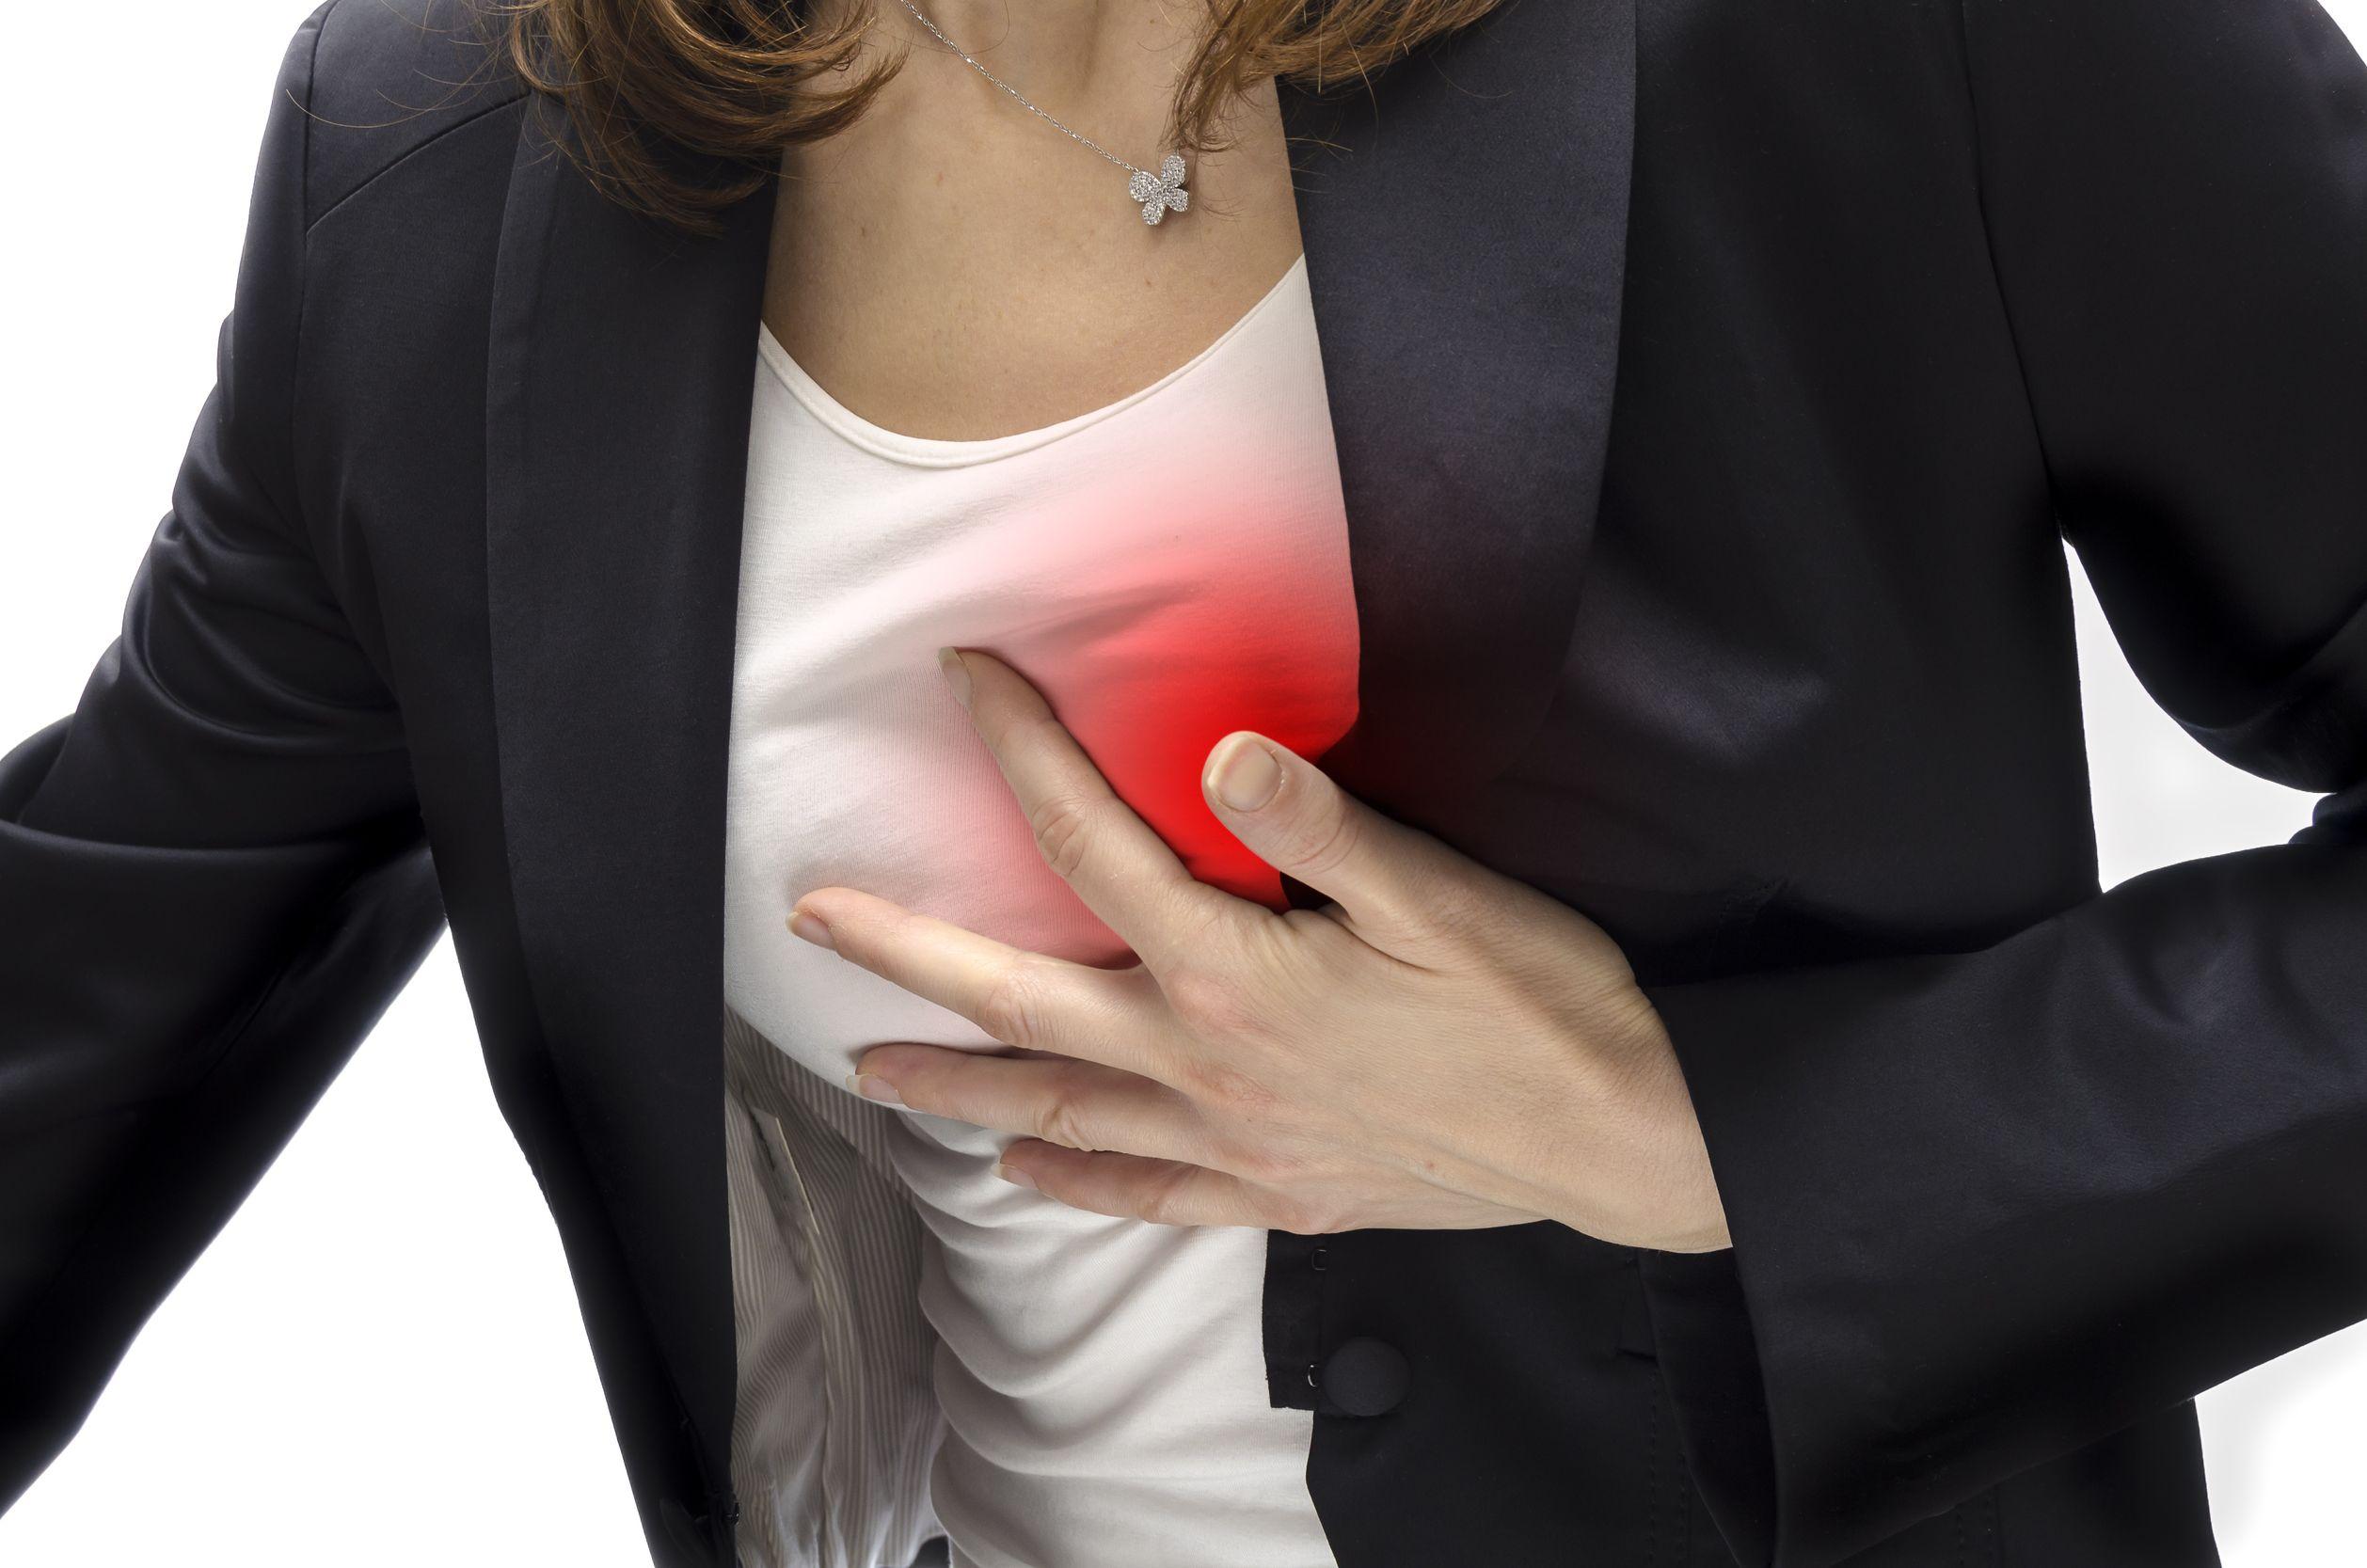 http://womenpla.net/wp-content/uploads/2013/10/Heart-Attack-Risk.jpg